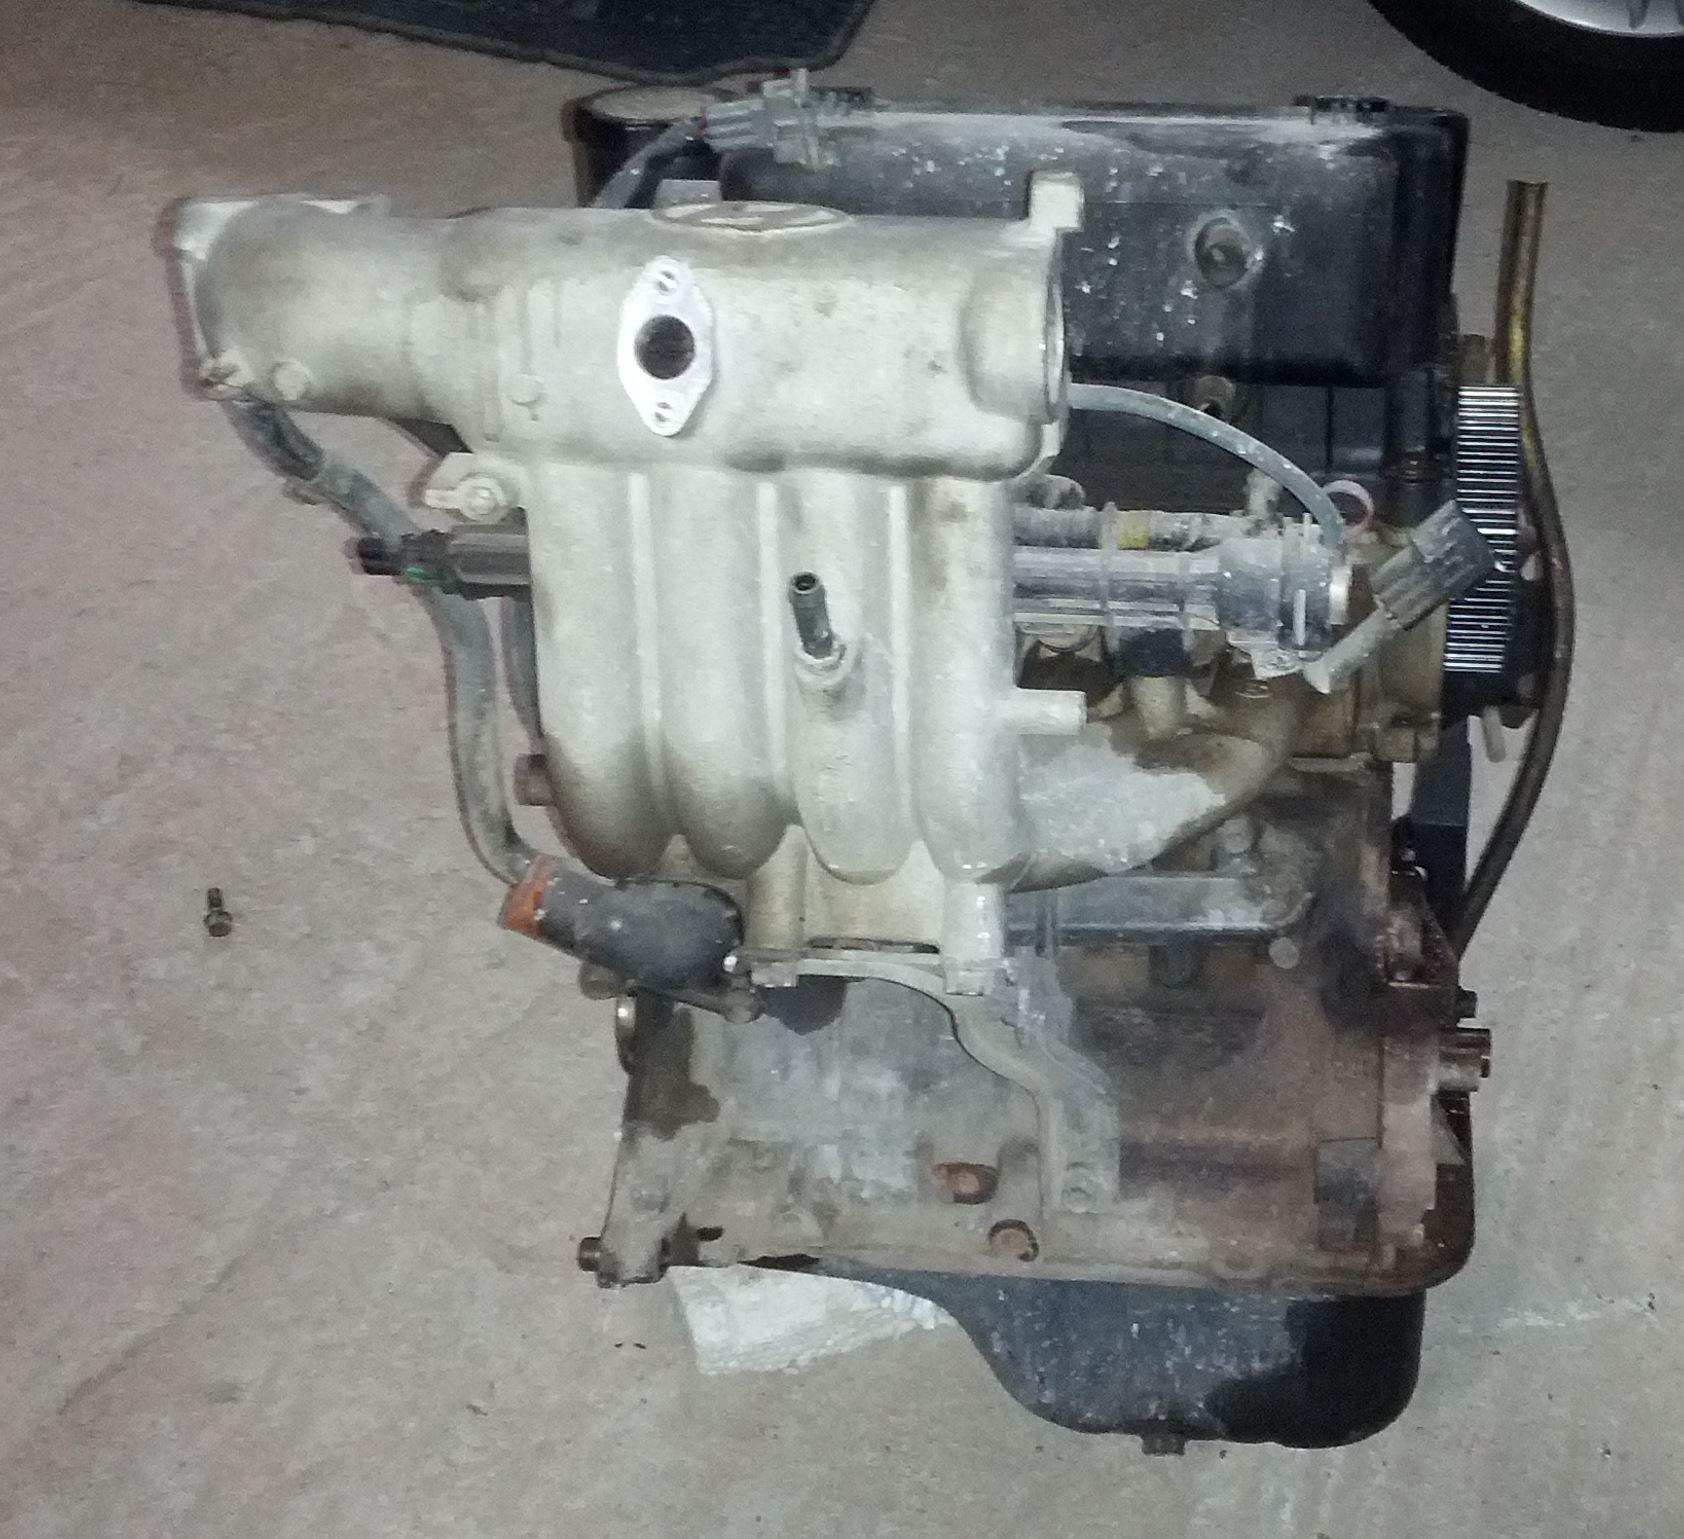 Hyundai Atos Engine Teardown Part 1 Fuel Pressure Diagram Backside